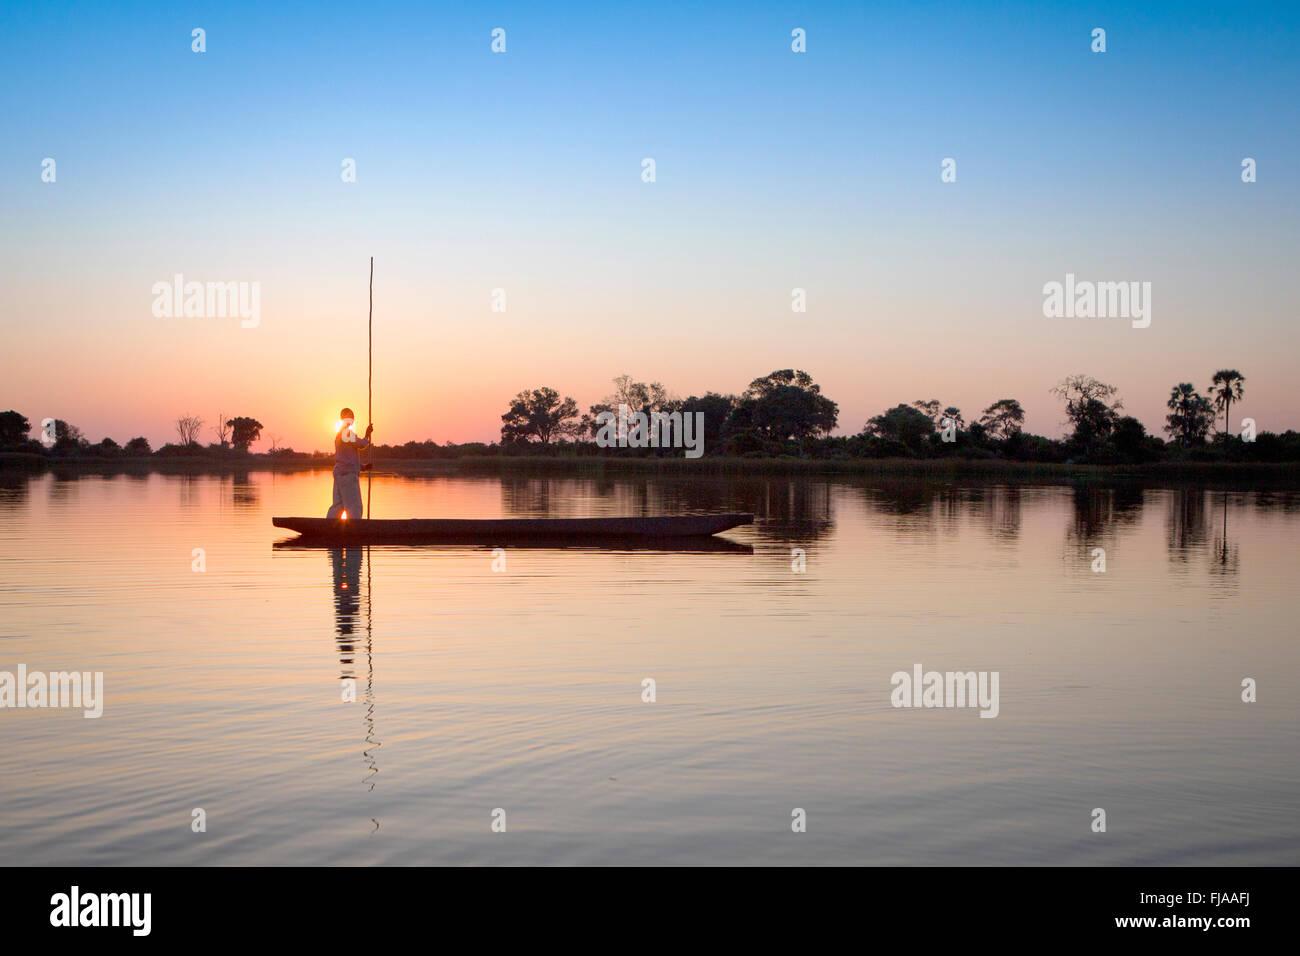 Mokoro in Okavango Delta - Stock Image